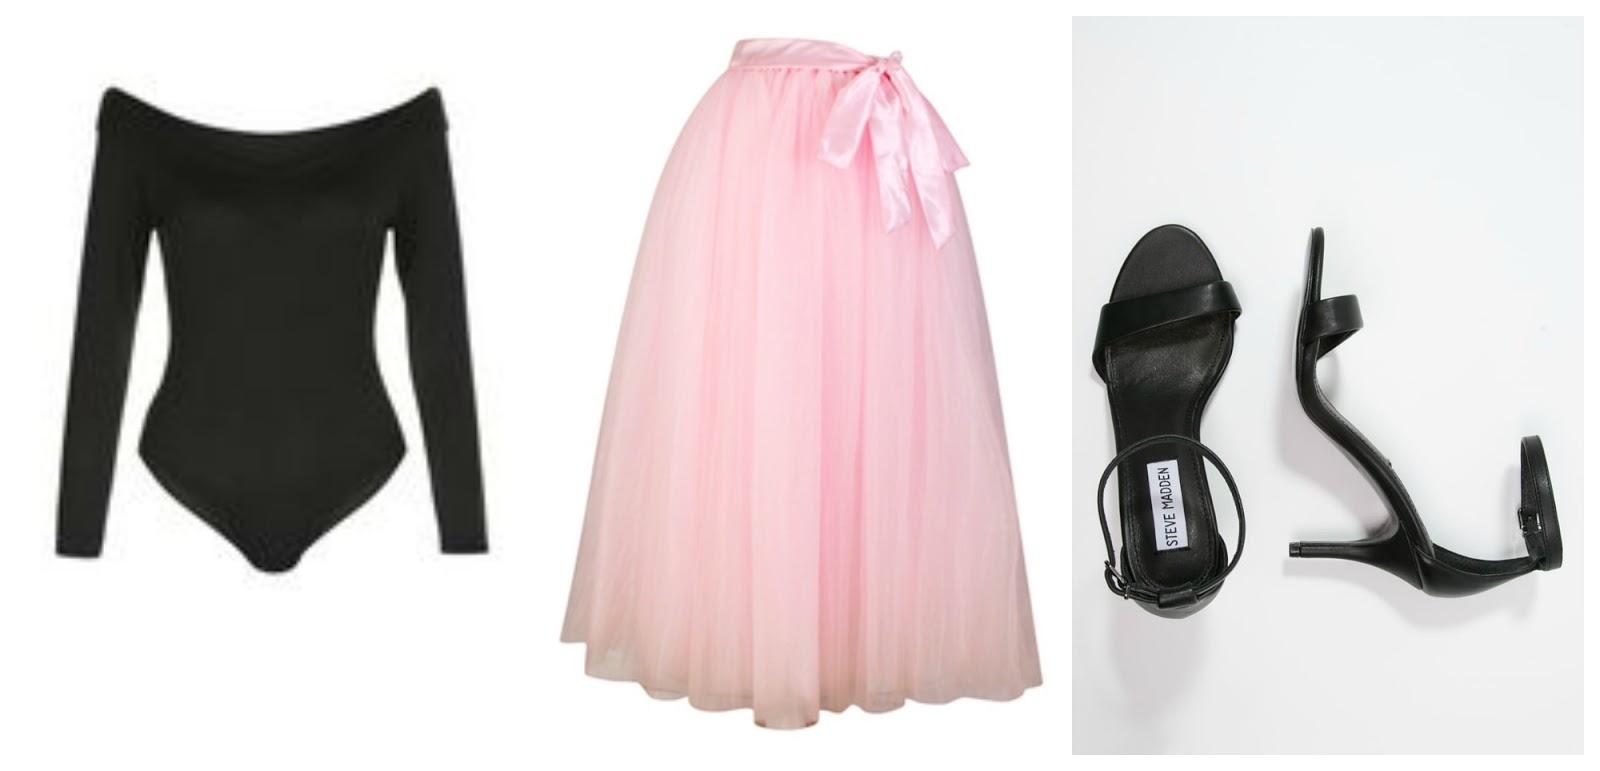 Wedding Guest Outfit Ideas | KIZIWOO